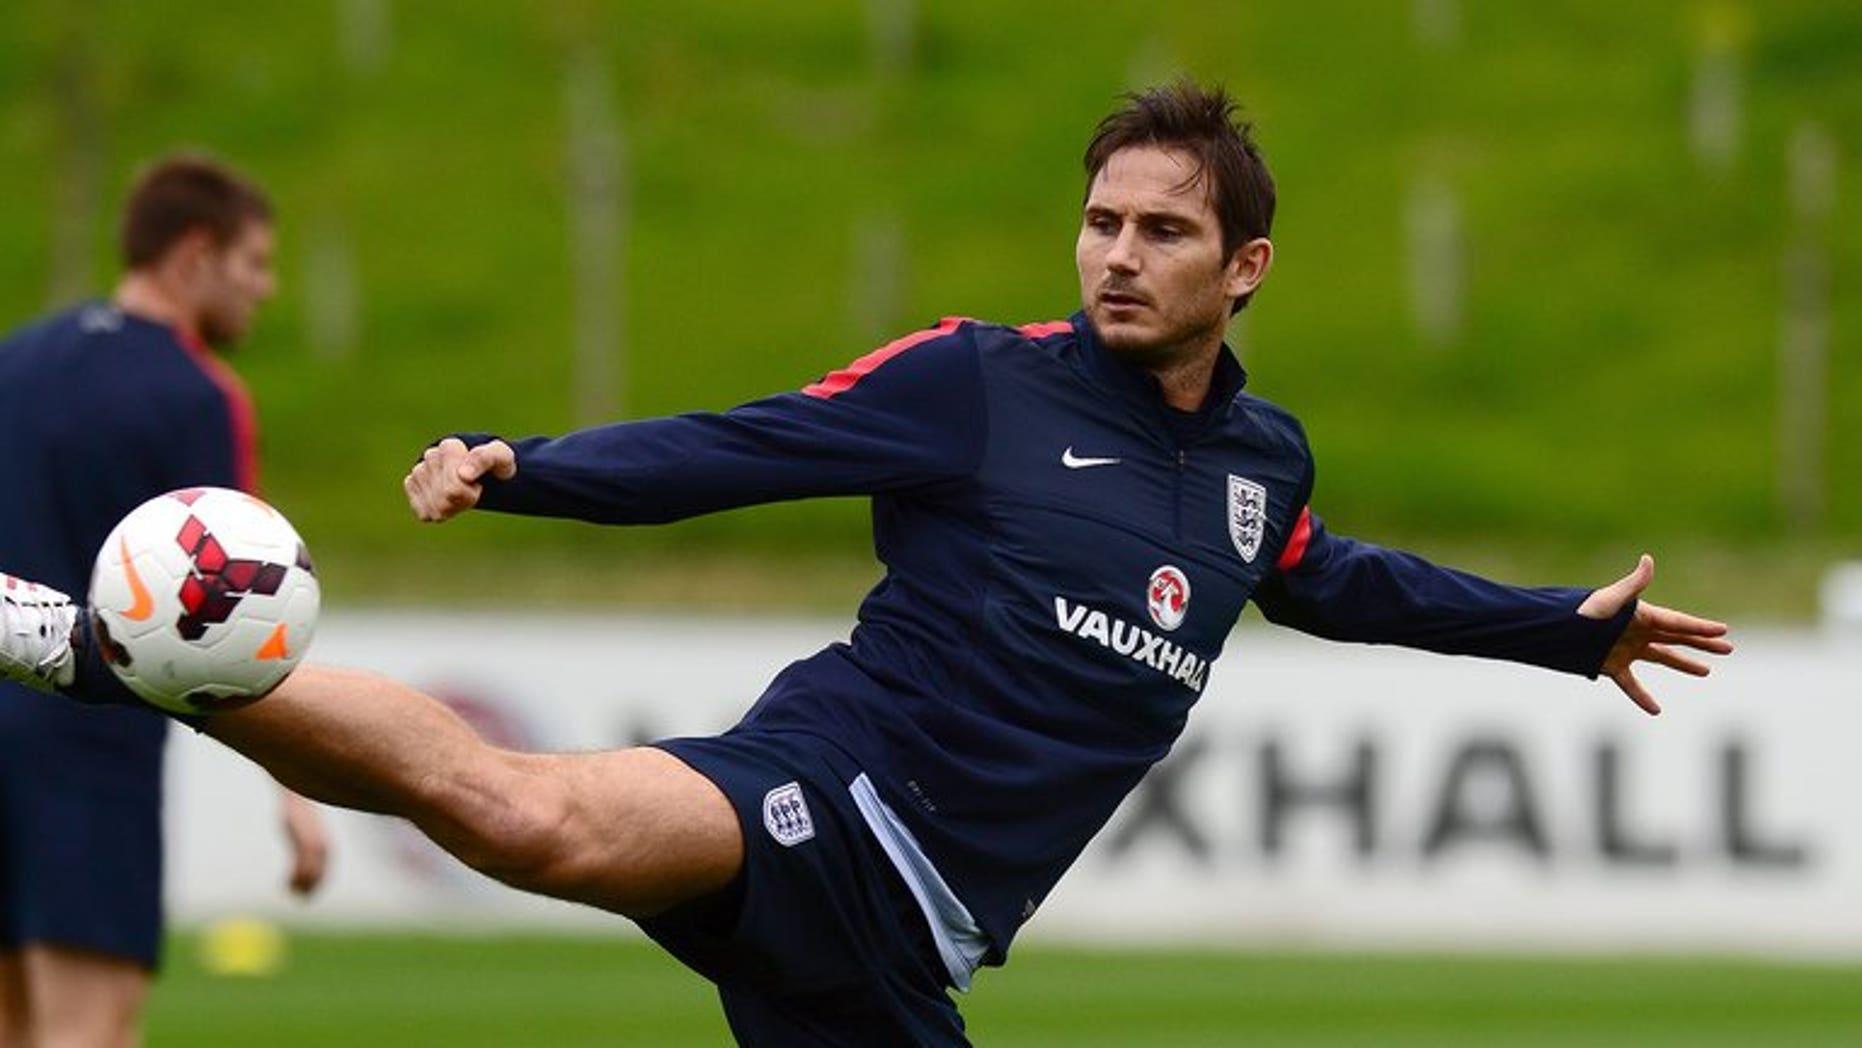 England midfielder Frank Lampard kicks the ball in Burton-on-Trent, central England, on September 3, 2013.